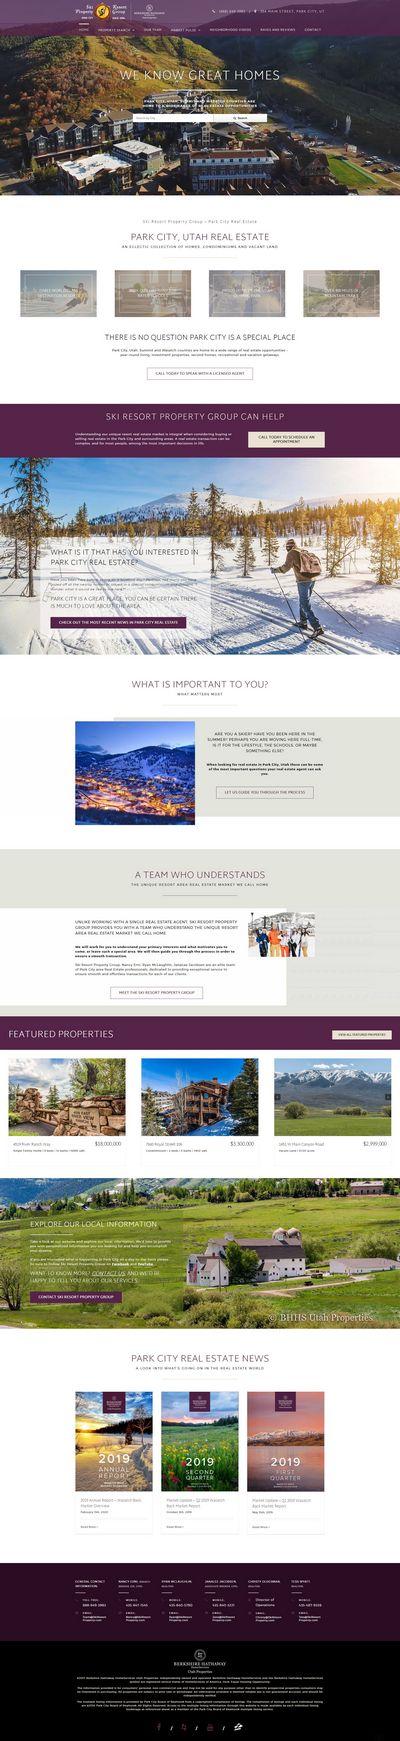 Ski Resort Property Group